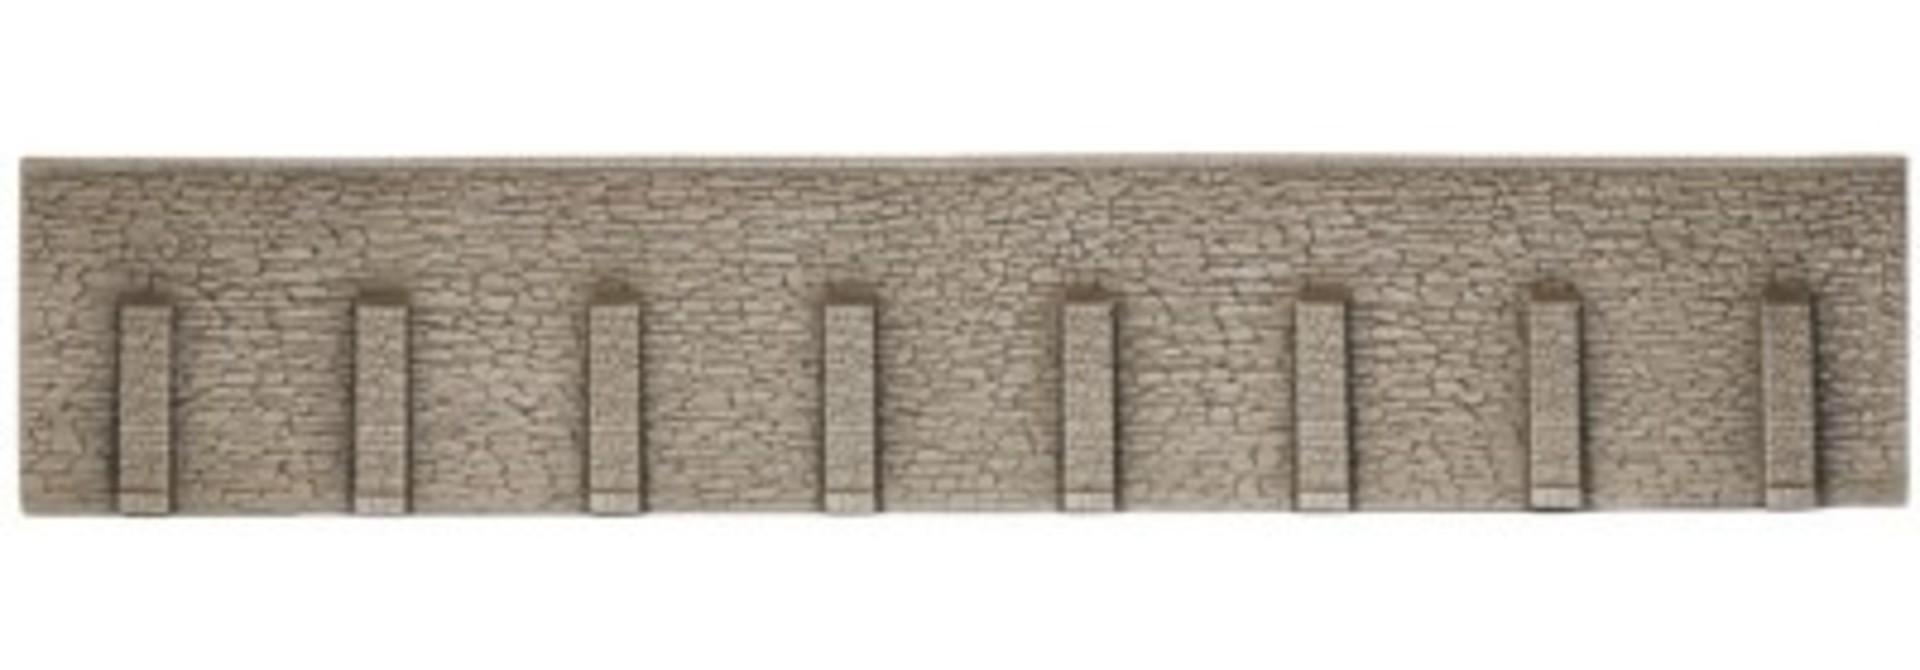 58066           Stützmauer